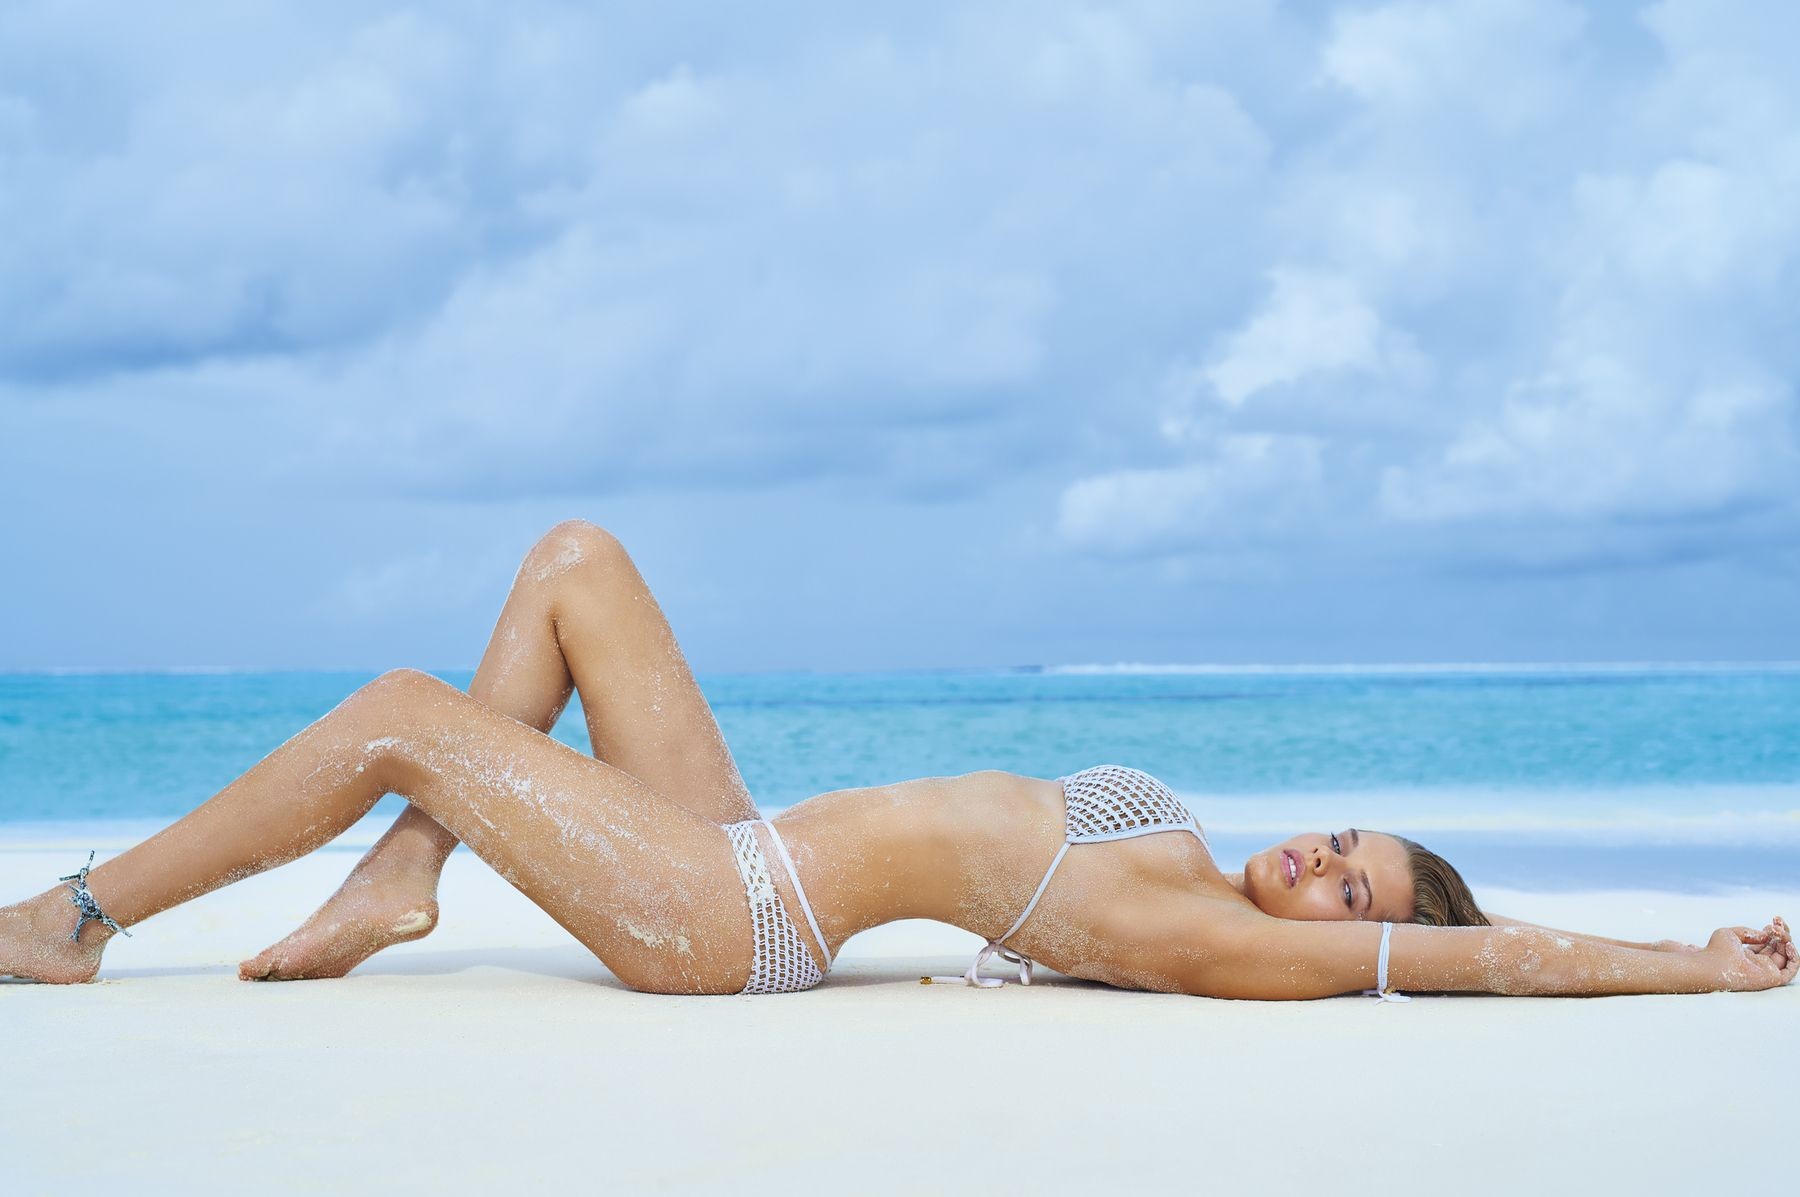 Solveig-Mork-Hansen-Sexy-Topless-2